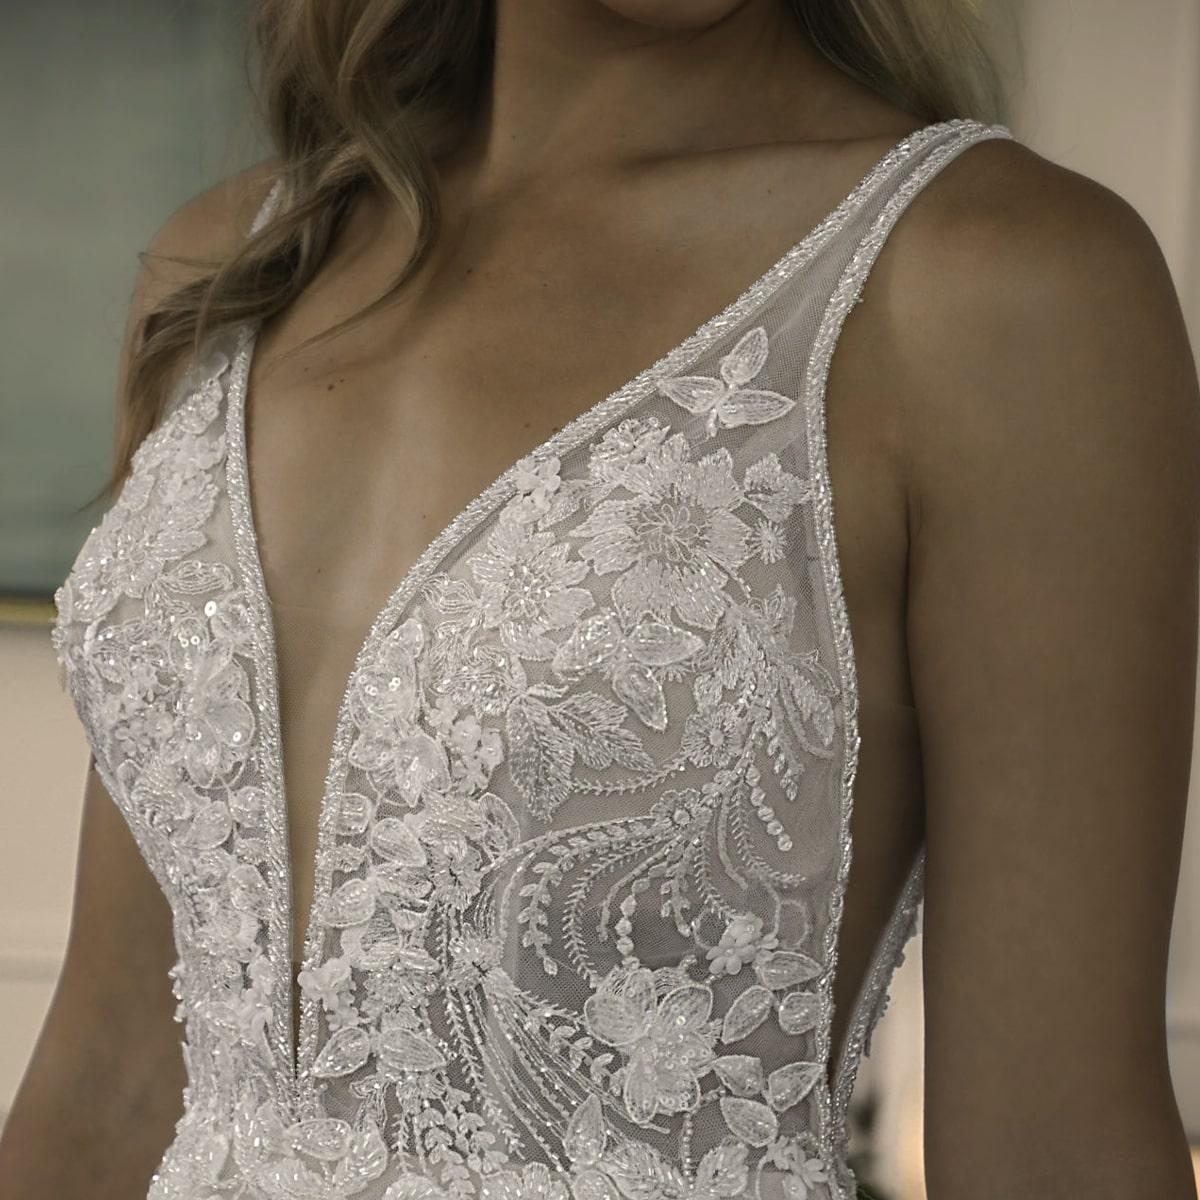 Plunging Neckline Trending Wedding Dresses